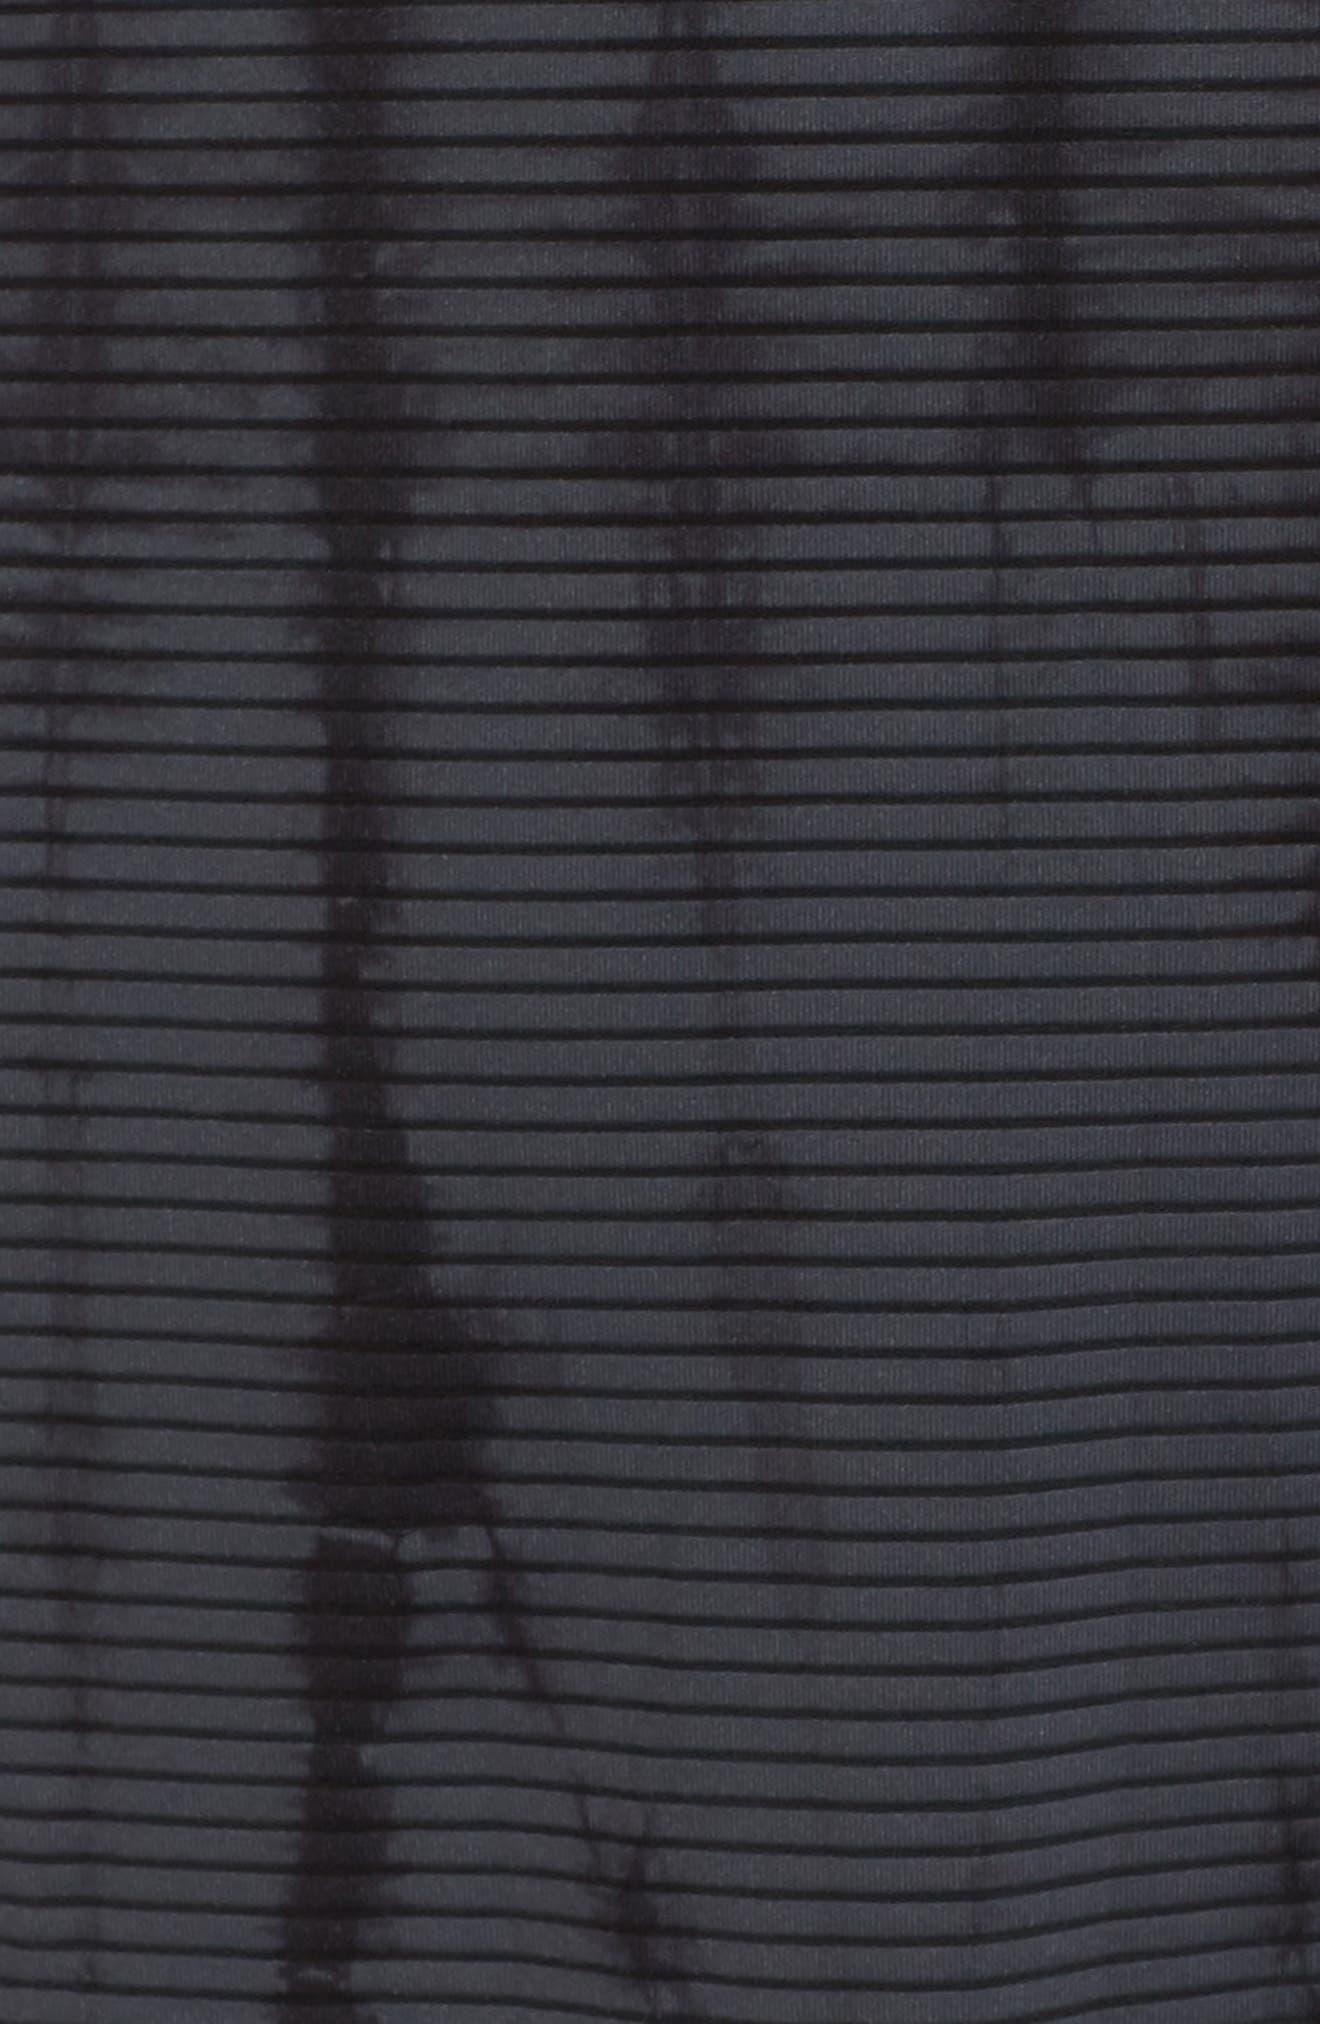 Waves Tie Dye Gray Hooded Pullover,                             Alternate thumbnail 6, color,                             DARK GREY